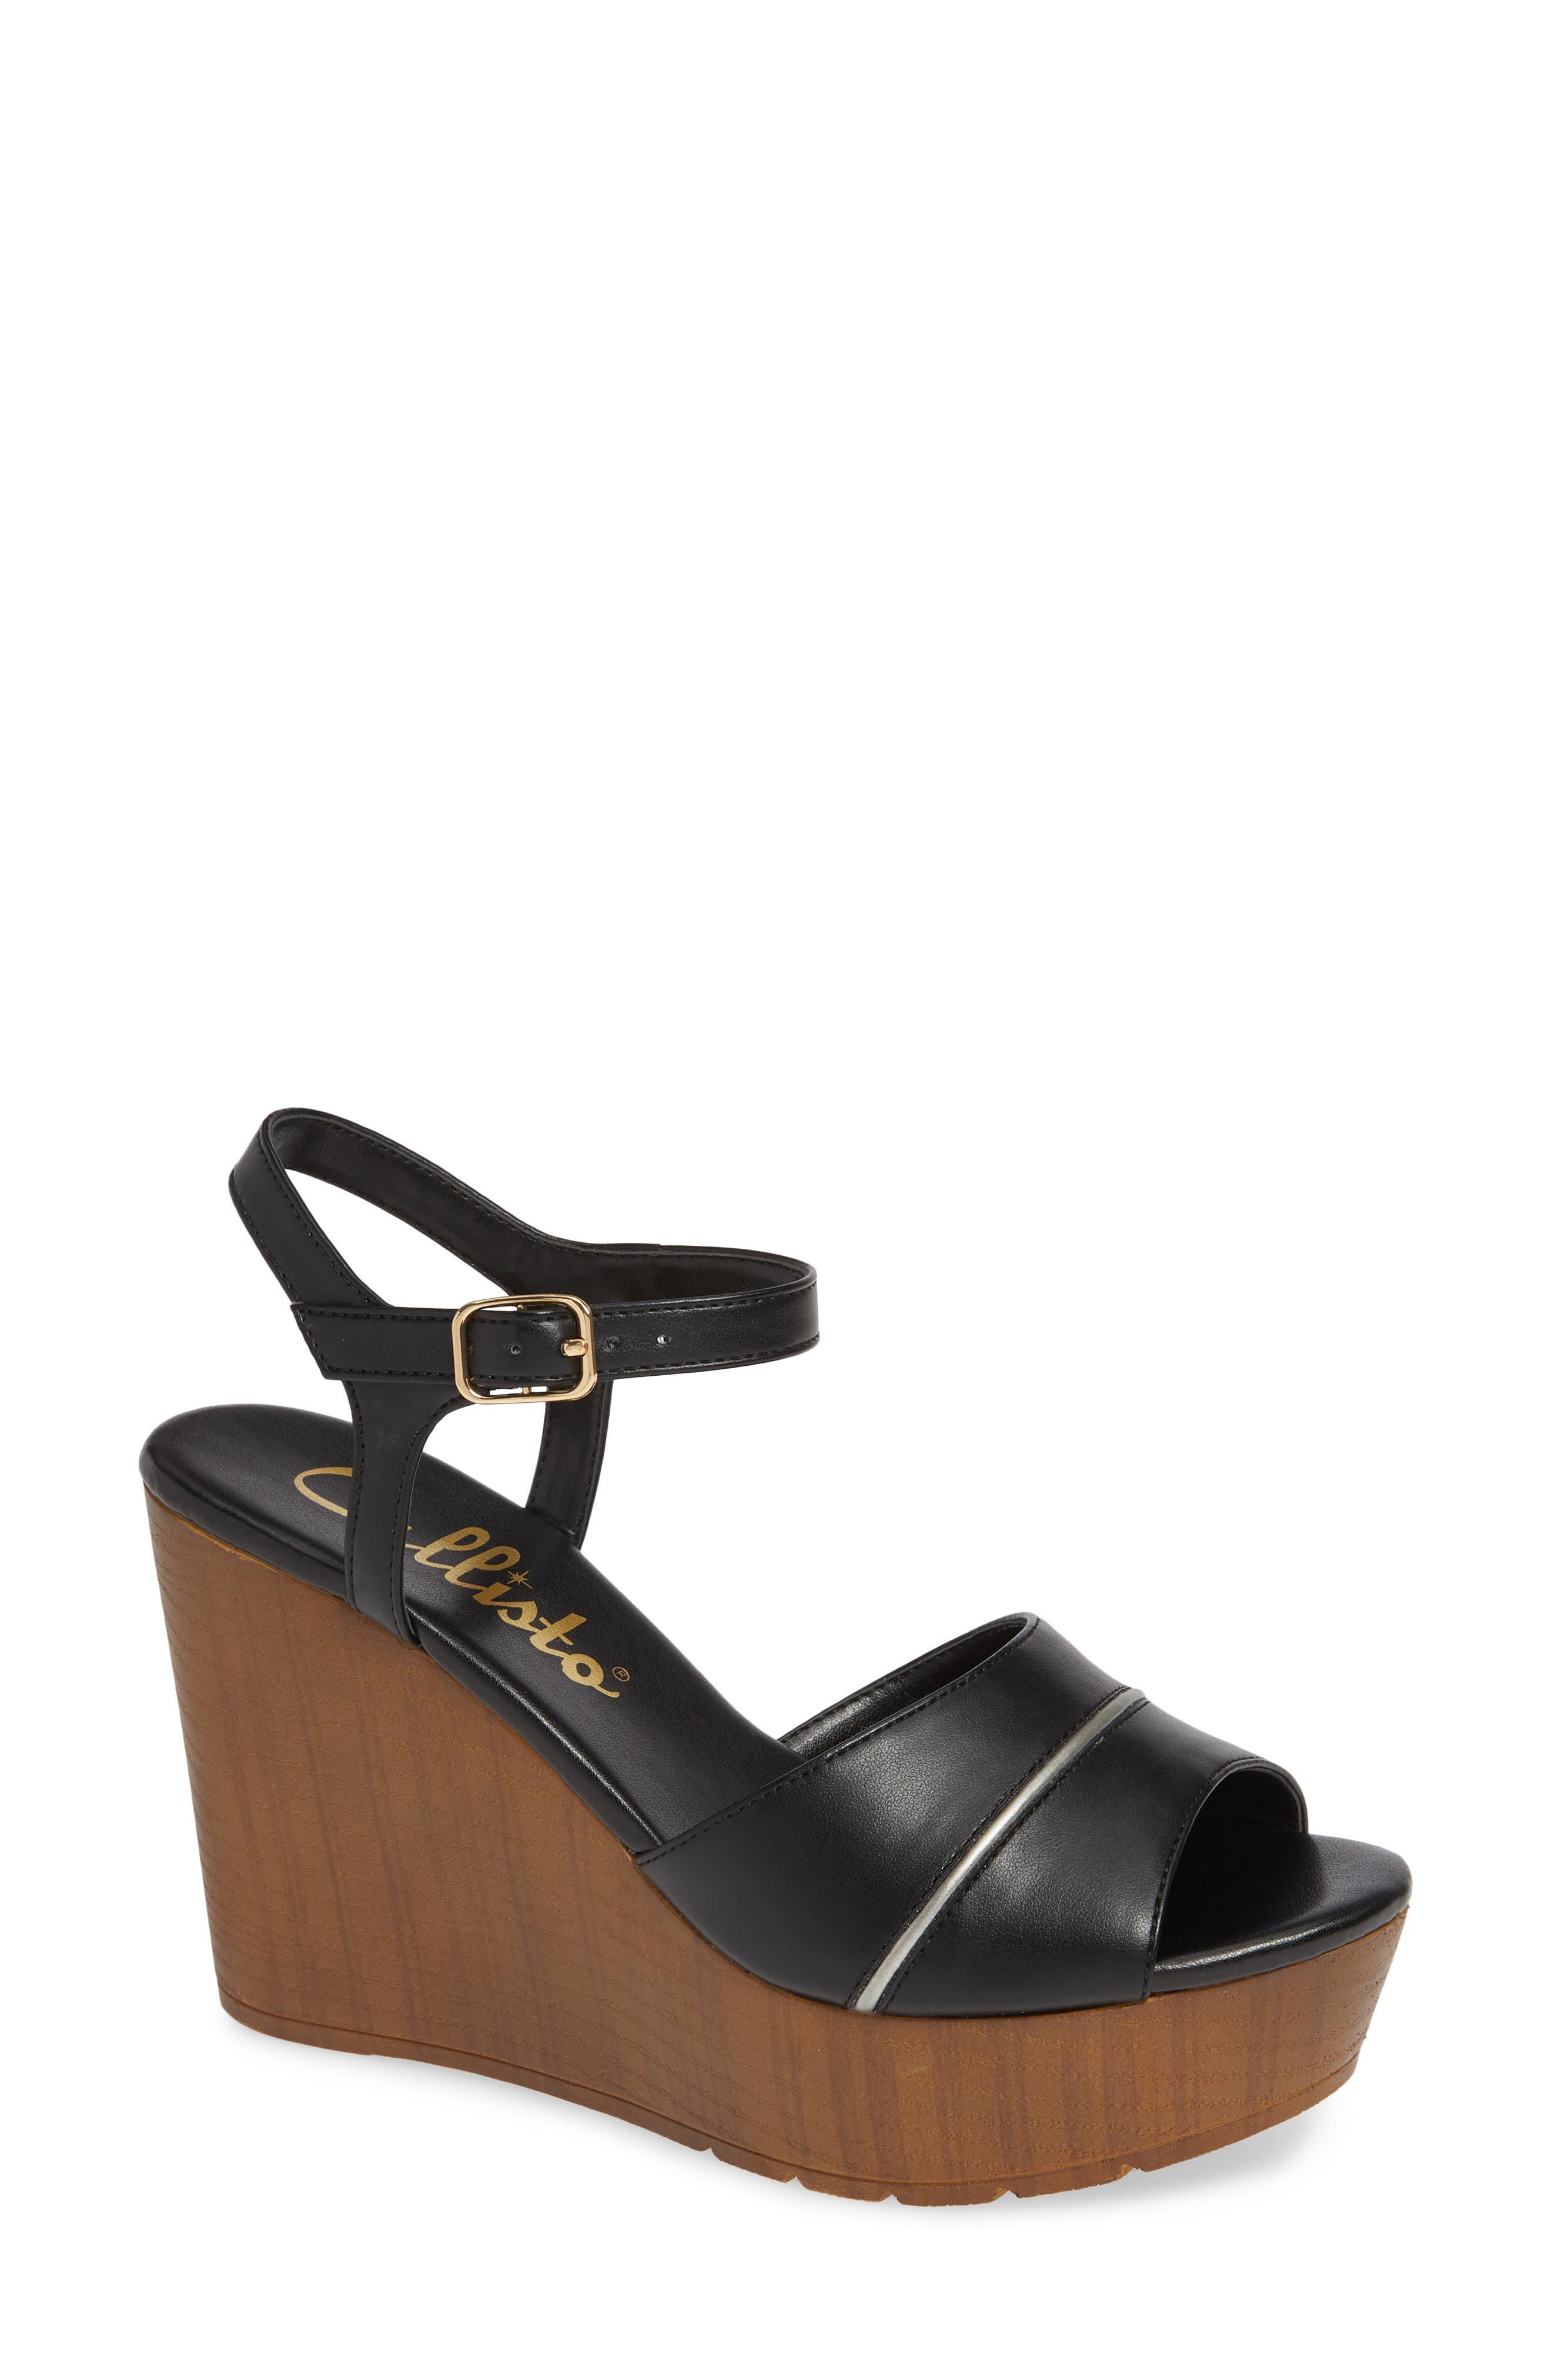 CALLISTO, Masalla Platform Wedge Sandal, Main thumbnail 1, color, BLACK FAUX LEATHER